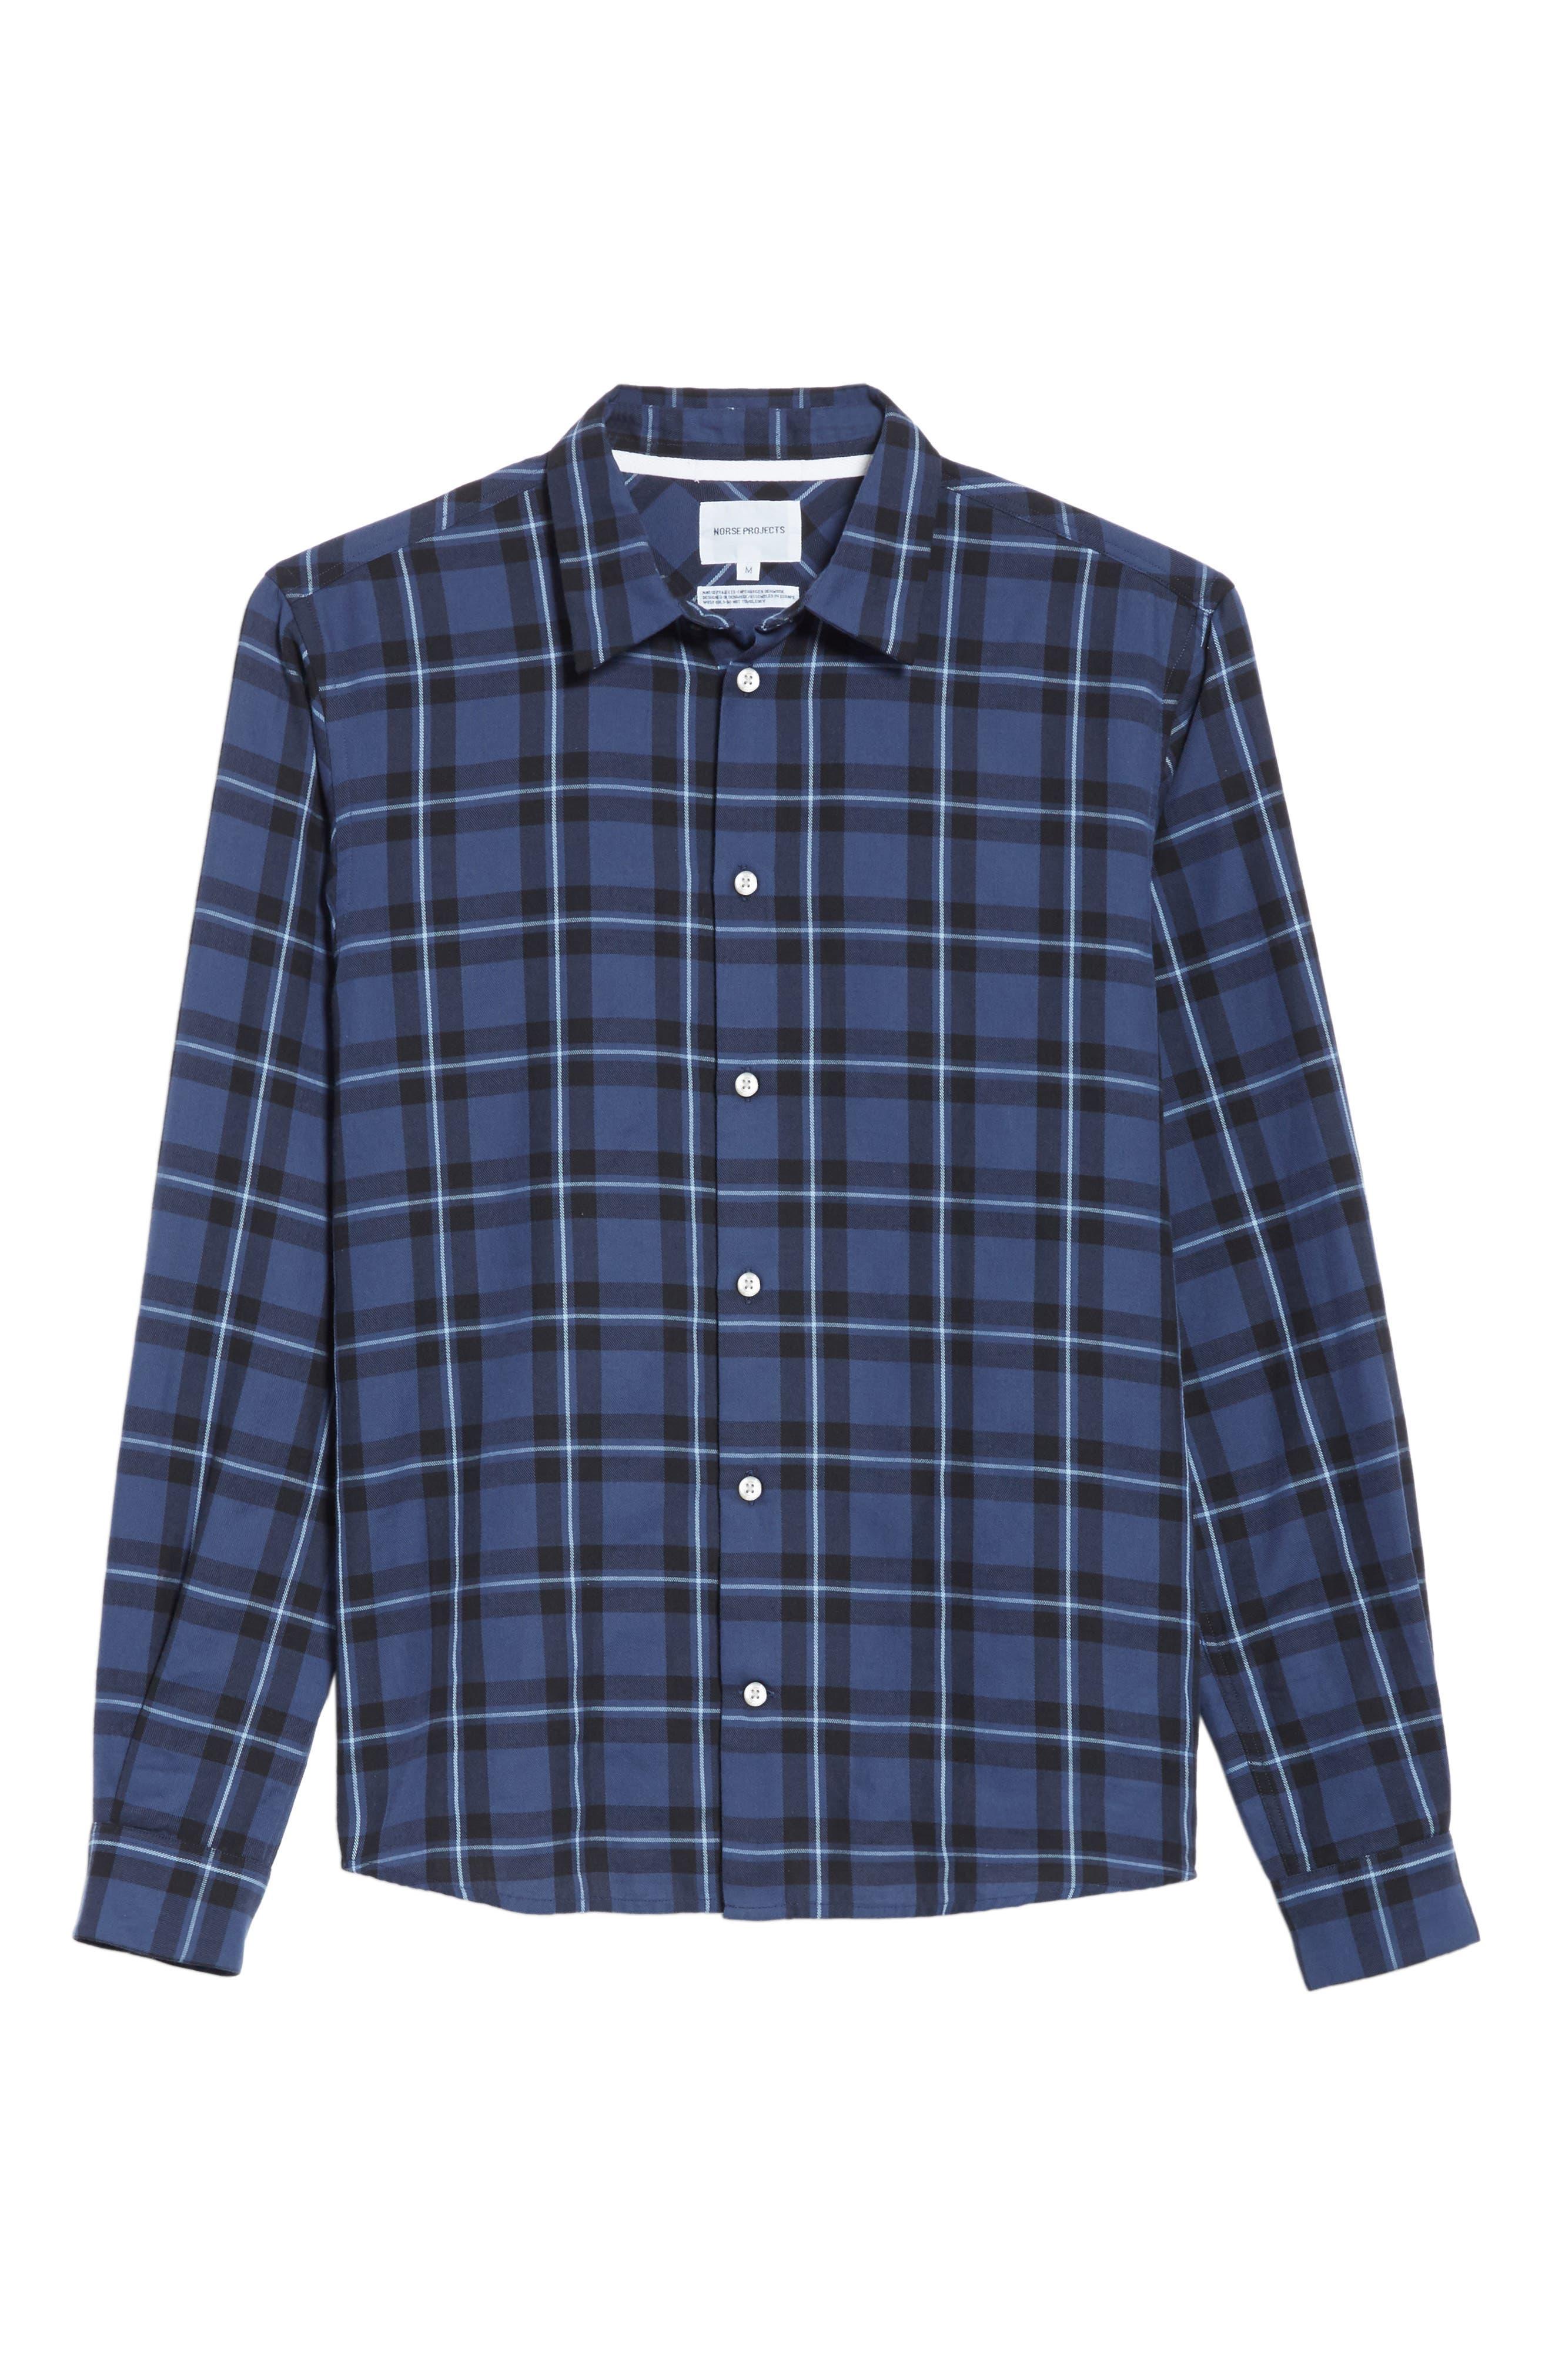 Hans Check Woven Shirt,                             Alternate thumbnail 6, color,                             410